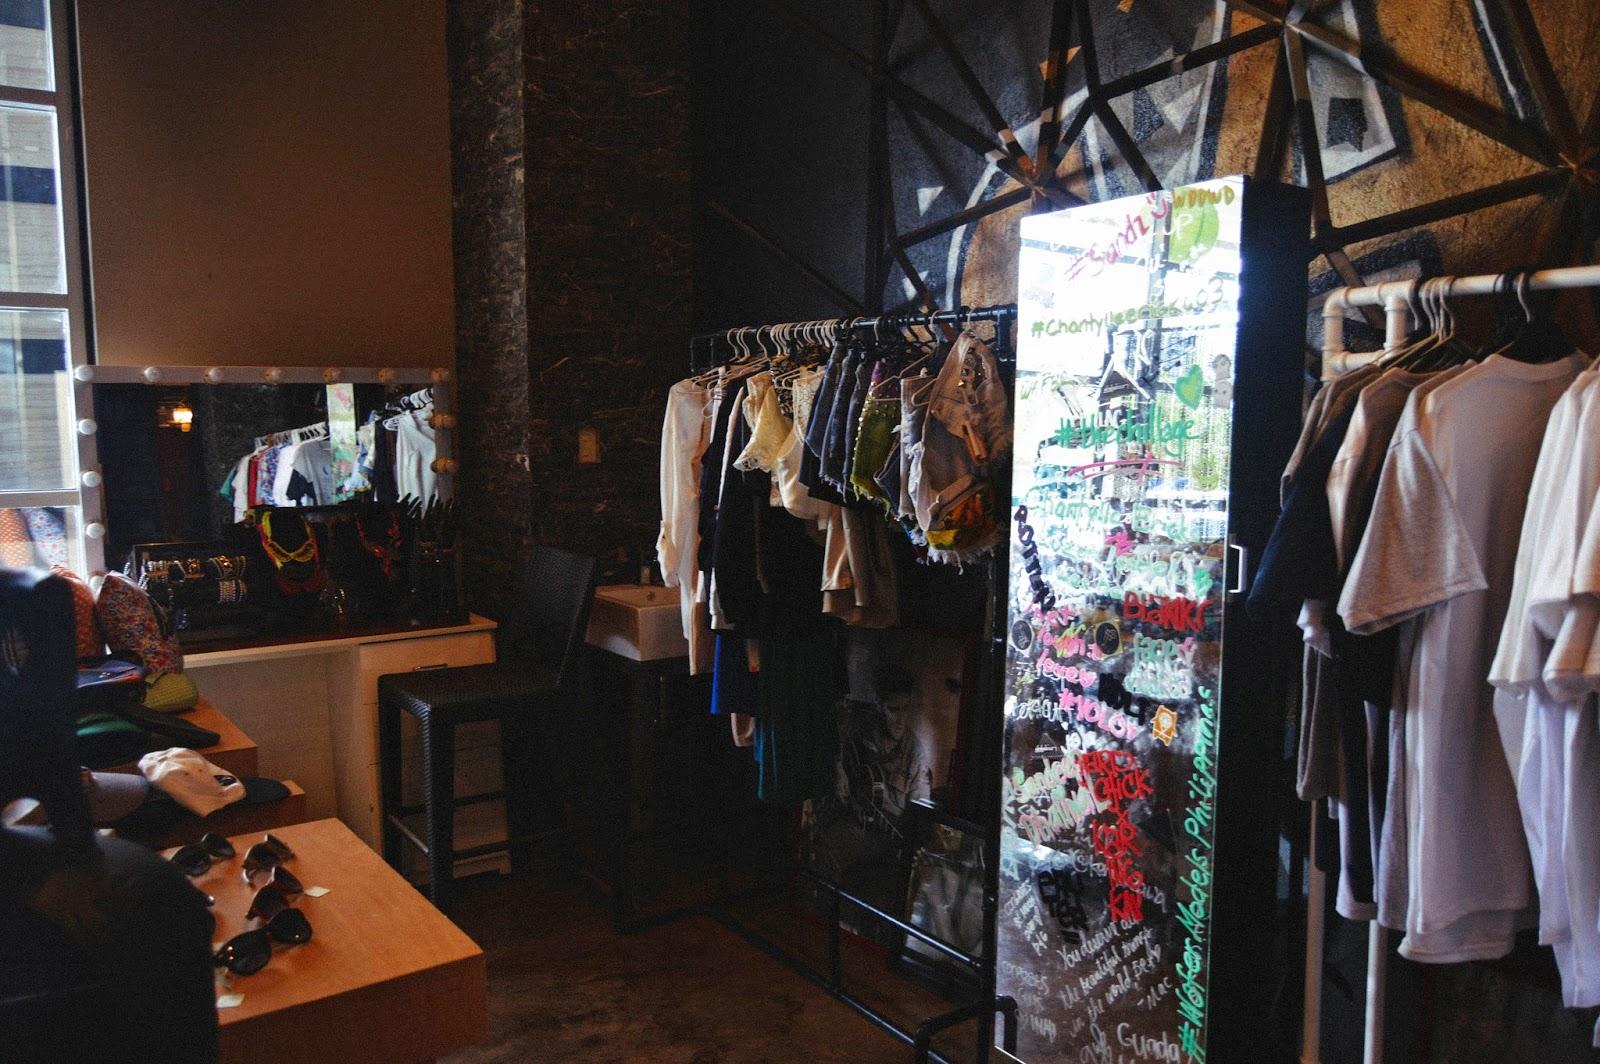 fashion blogger, style blogger, cebu blogger, cebu style blogger, blogger, filipina blogger, cebuana blogger, nested thoughts, katherine cutar, katherine anne cutar, katherineanika, katherine annika, ootd, ootd pilipinas, the chillage, chillage, the chillage cebu, chillage cebu, urban living, cafe, food, restaurants in cebu, cafes in cebu